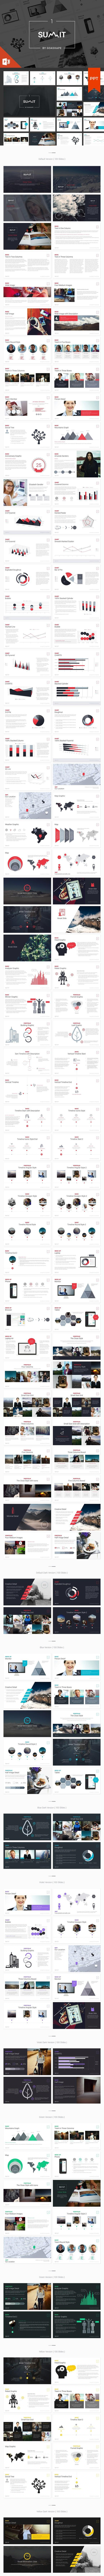 Summit PowerPoint Presentation. Google Slides Templates. $20.00 ...